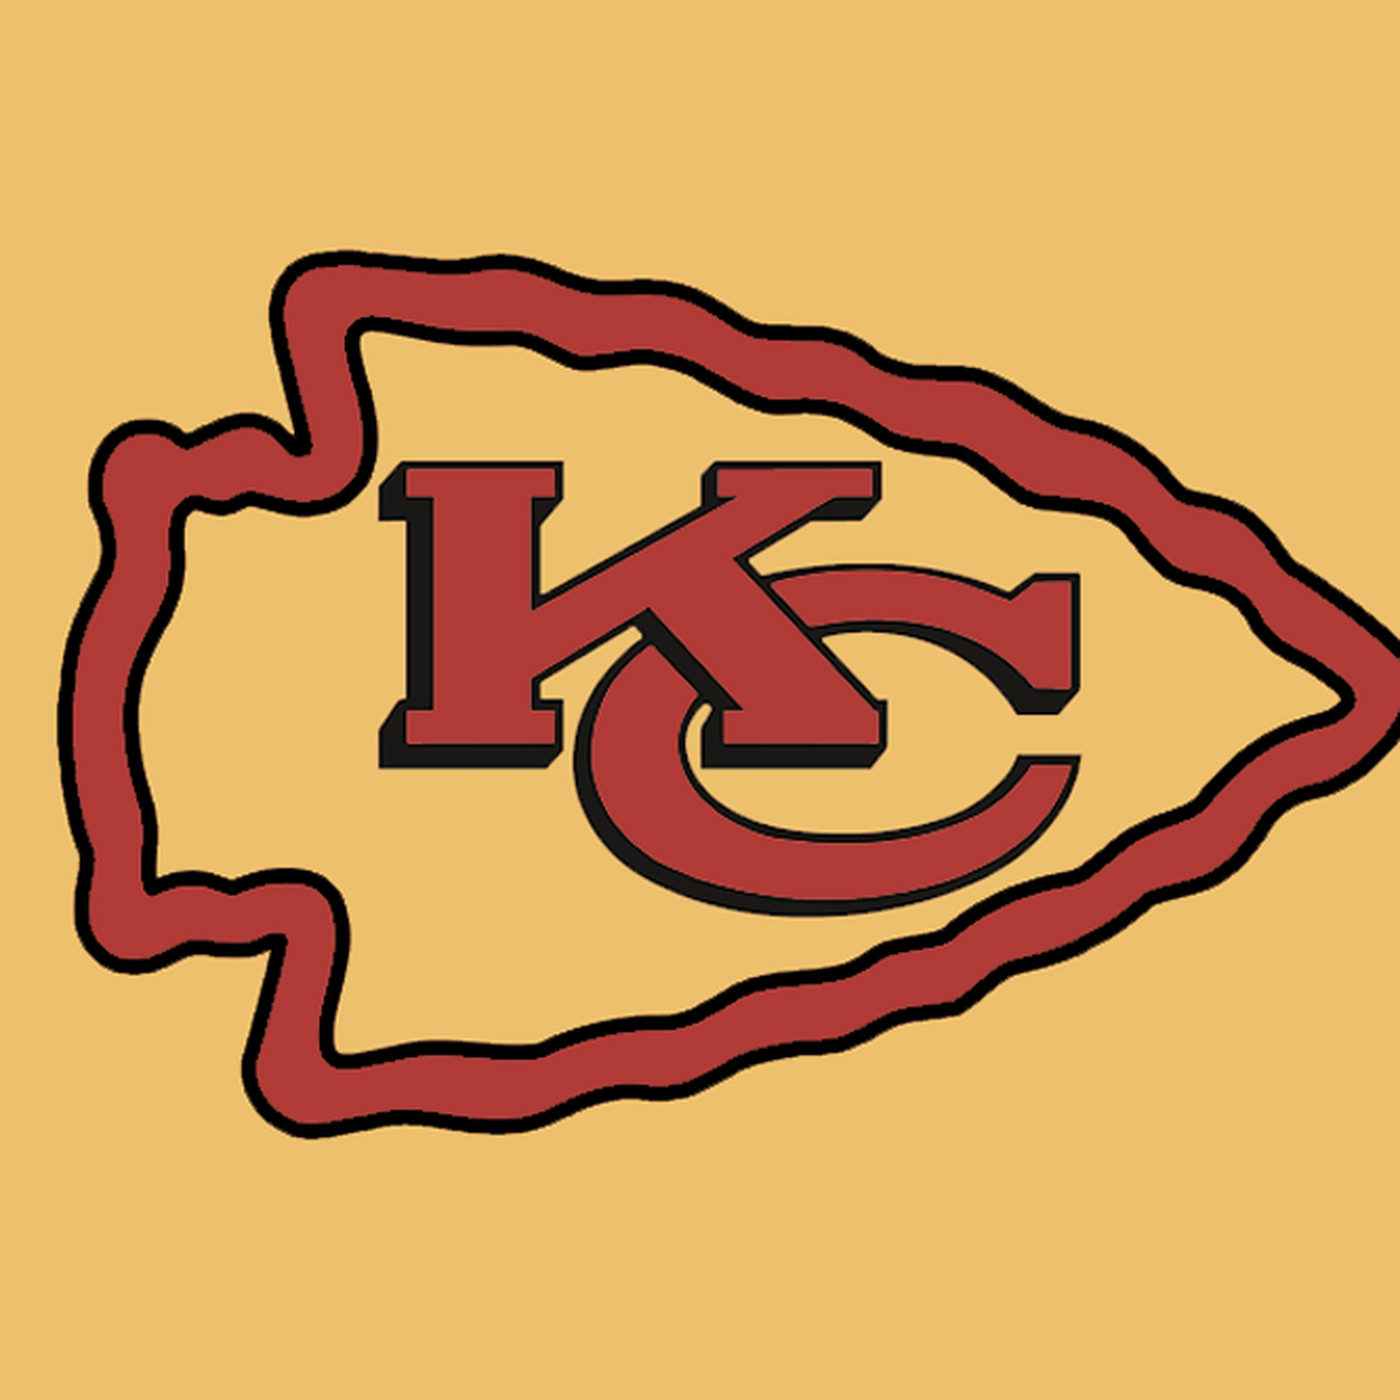 Kansas City Chiefs 2019 free agency rumor tracker: news